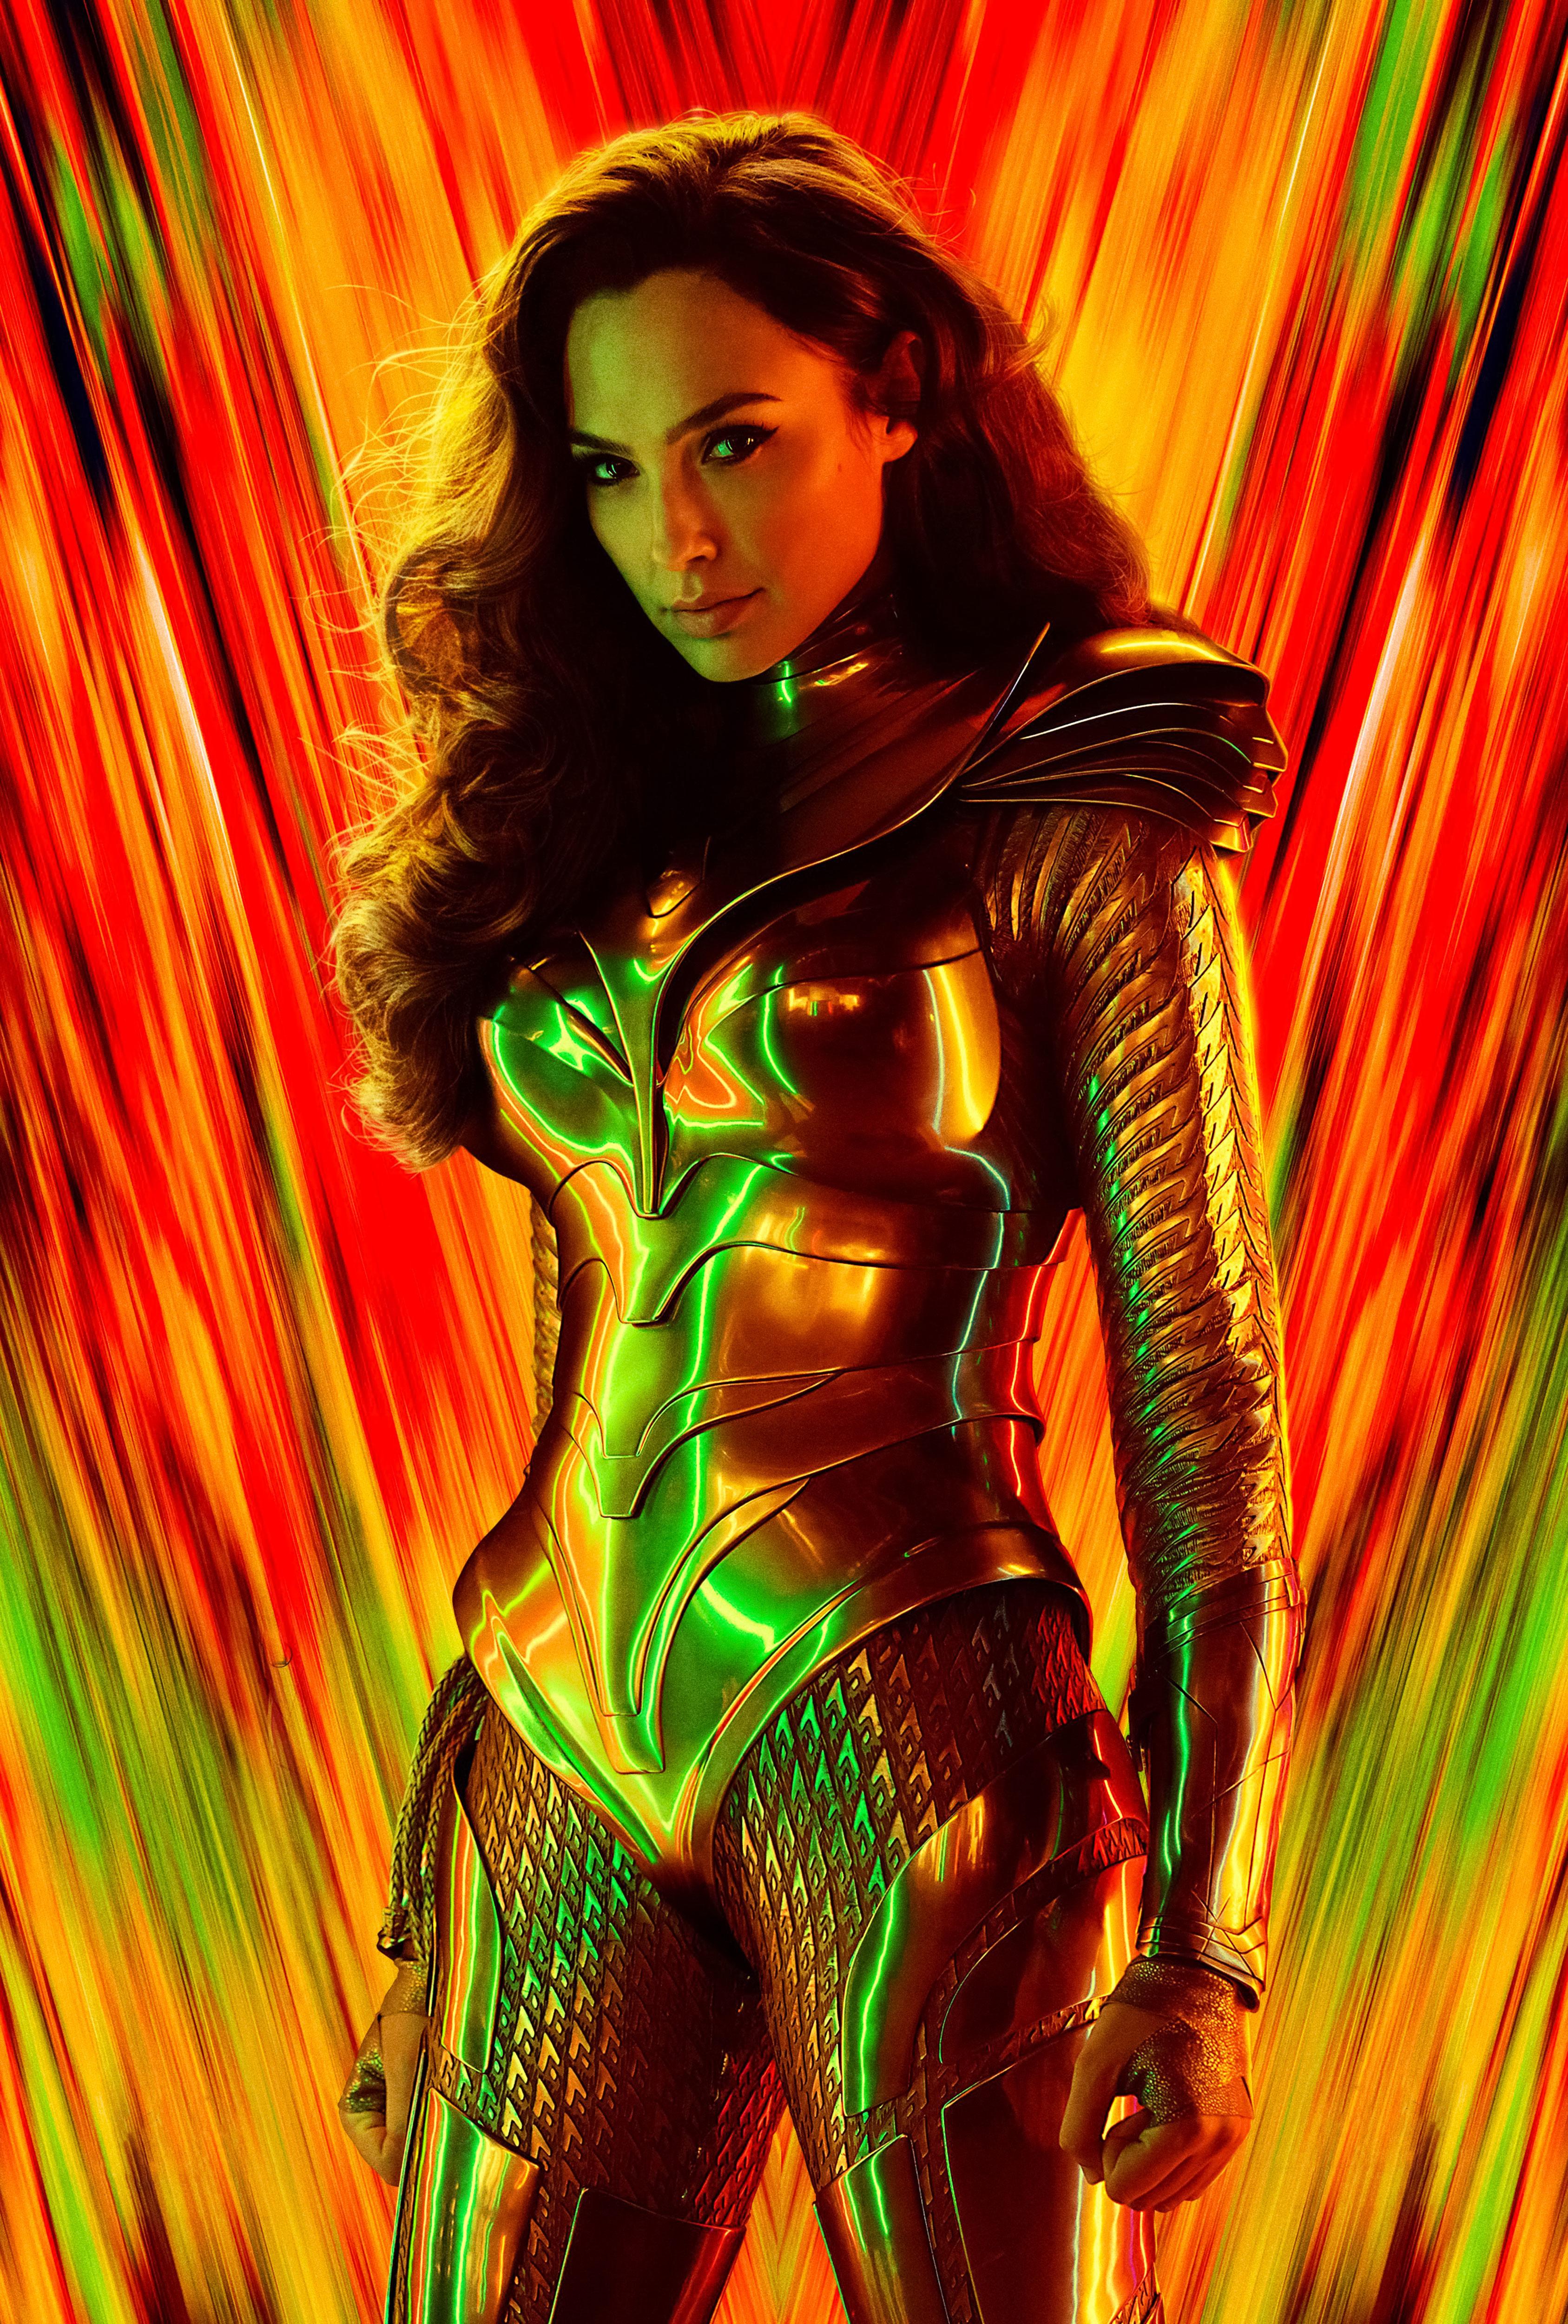 Free Download Wonder Woman 2 Wallpaper Hd Movies 4k Wallpapers